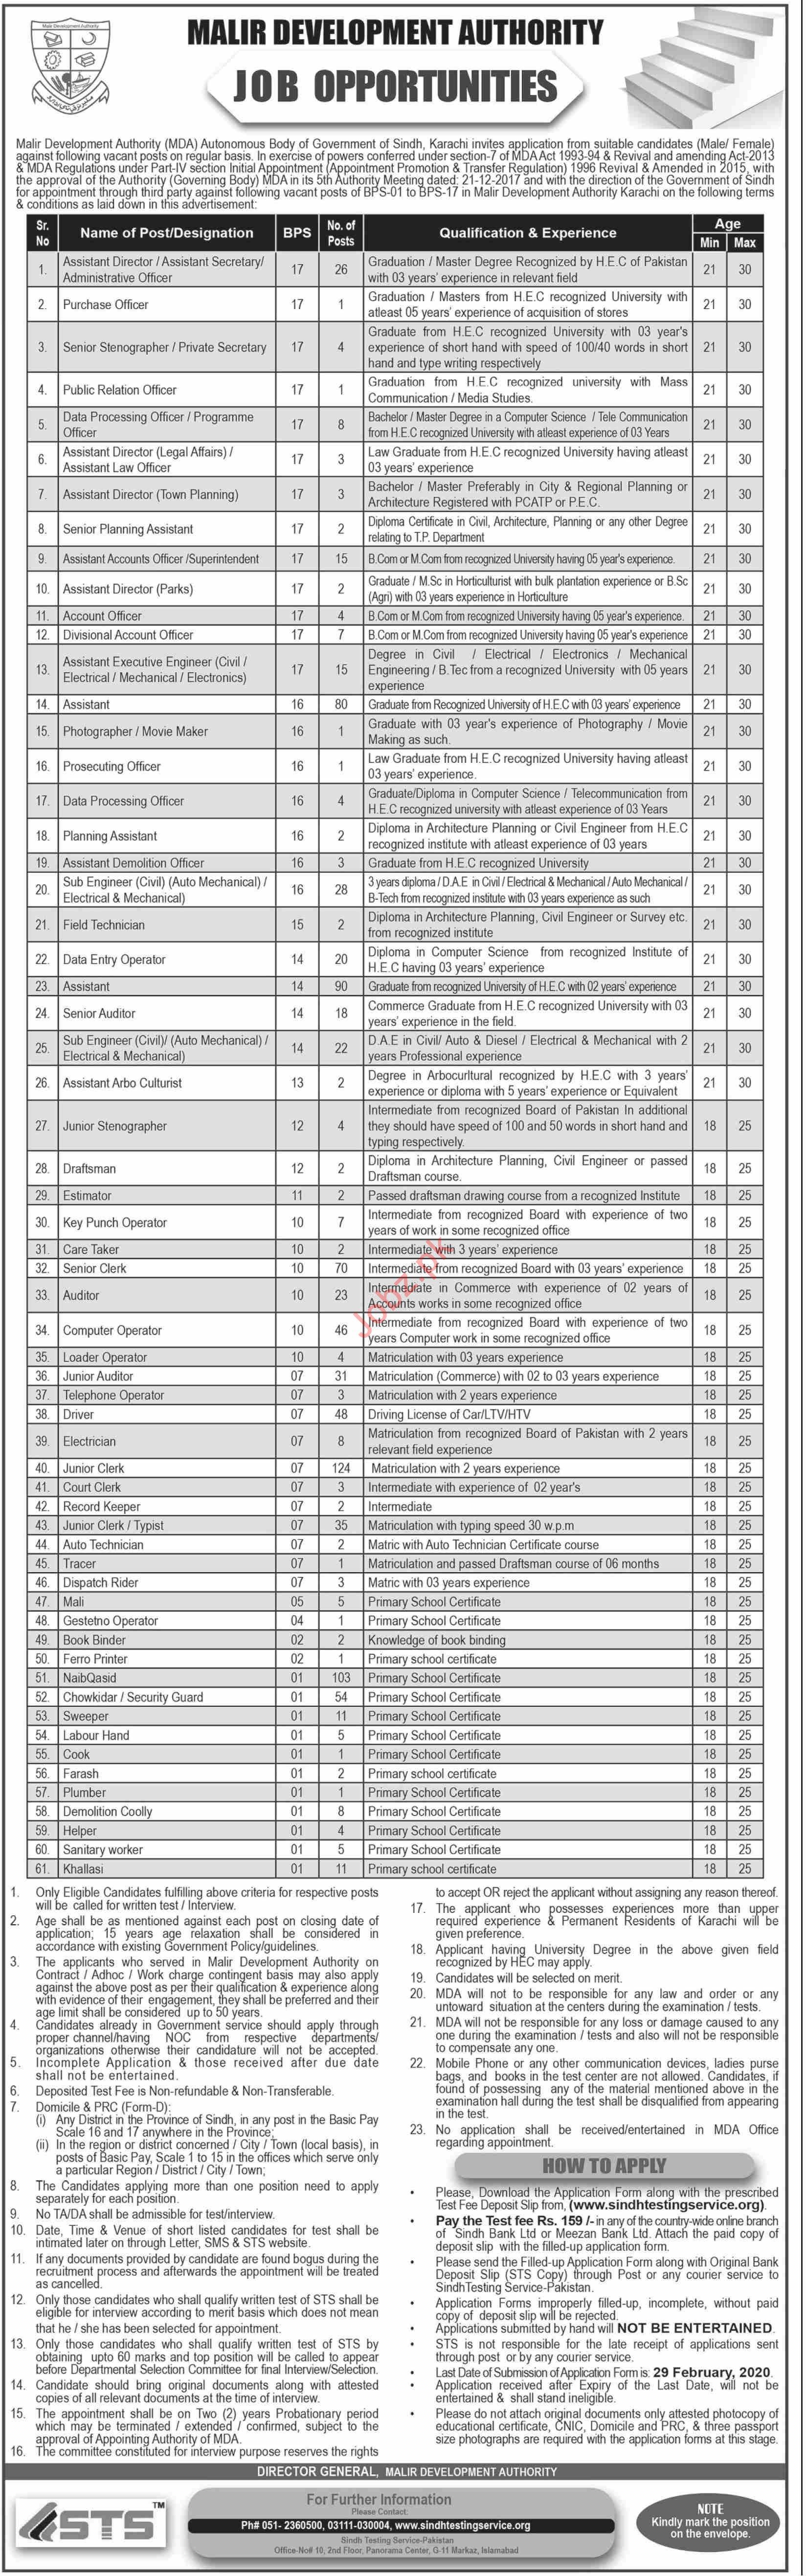 Malir Development Authority MDA Karachi Jobs 2020